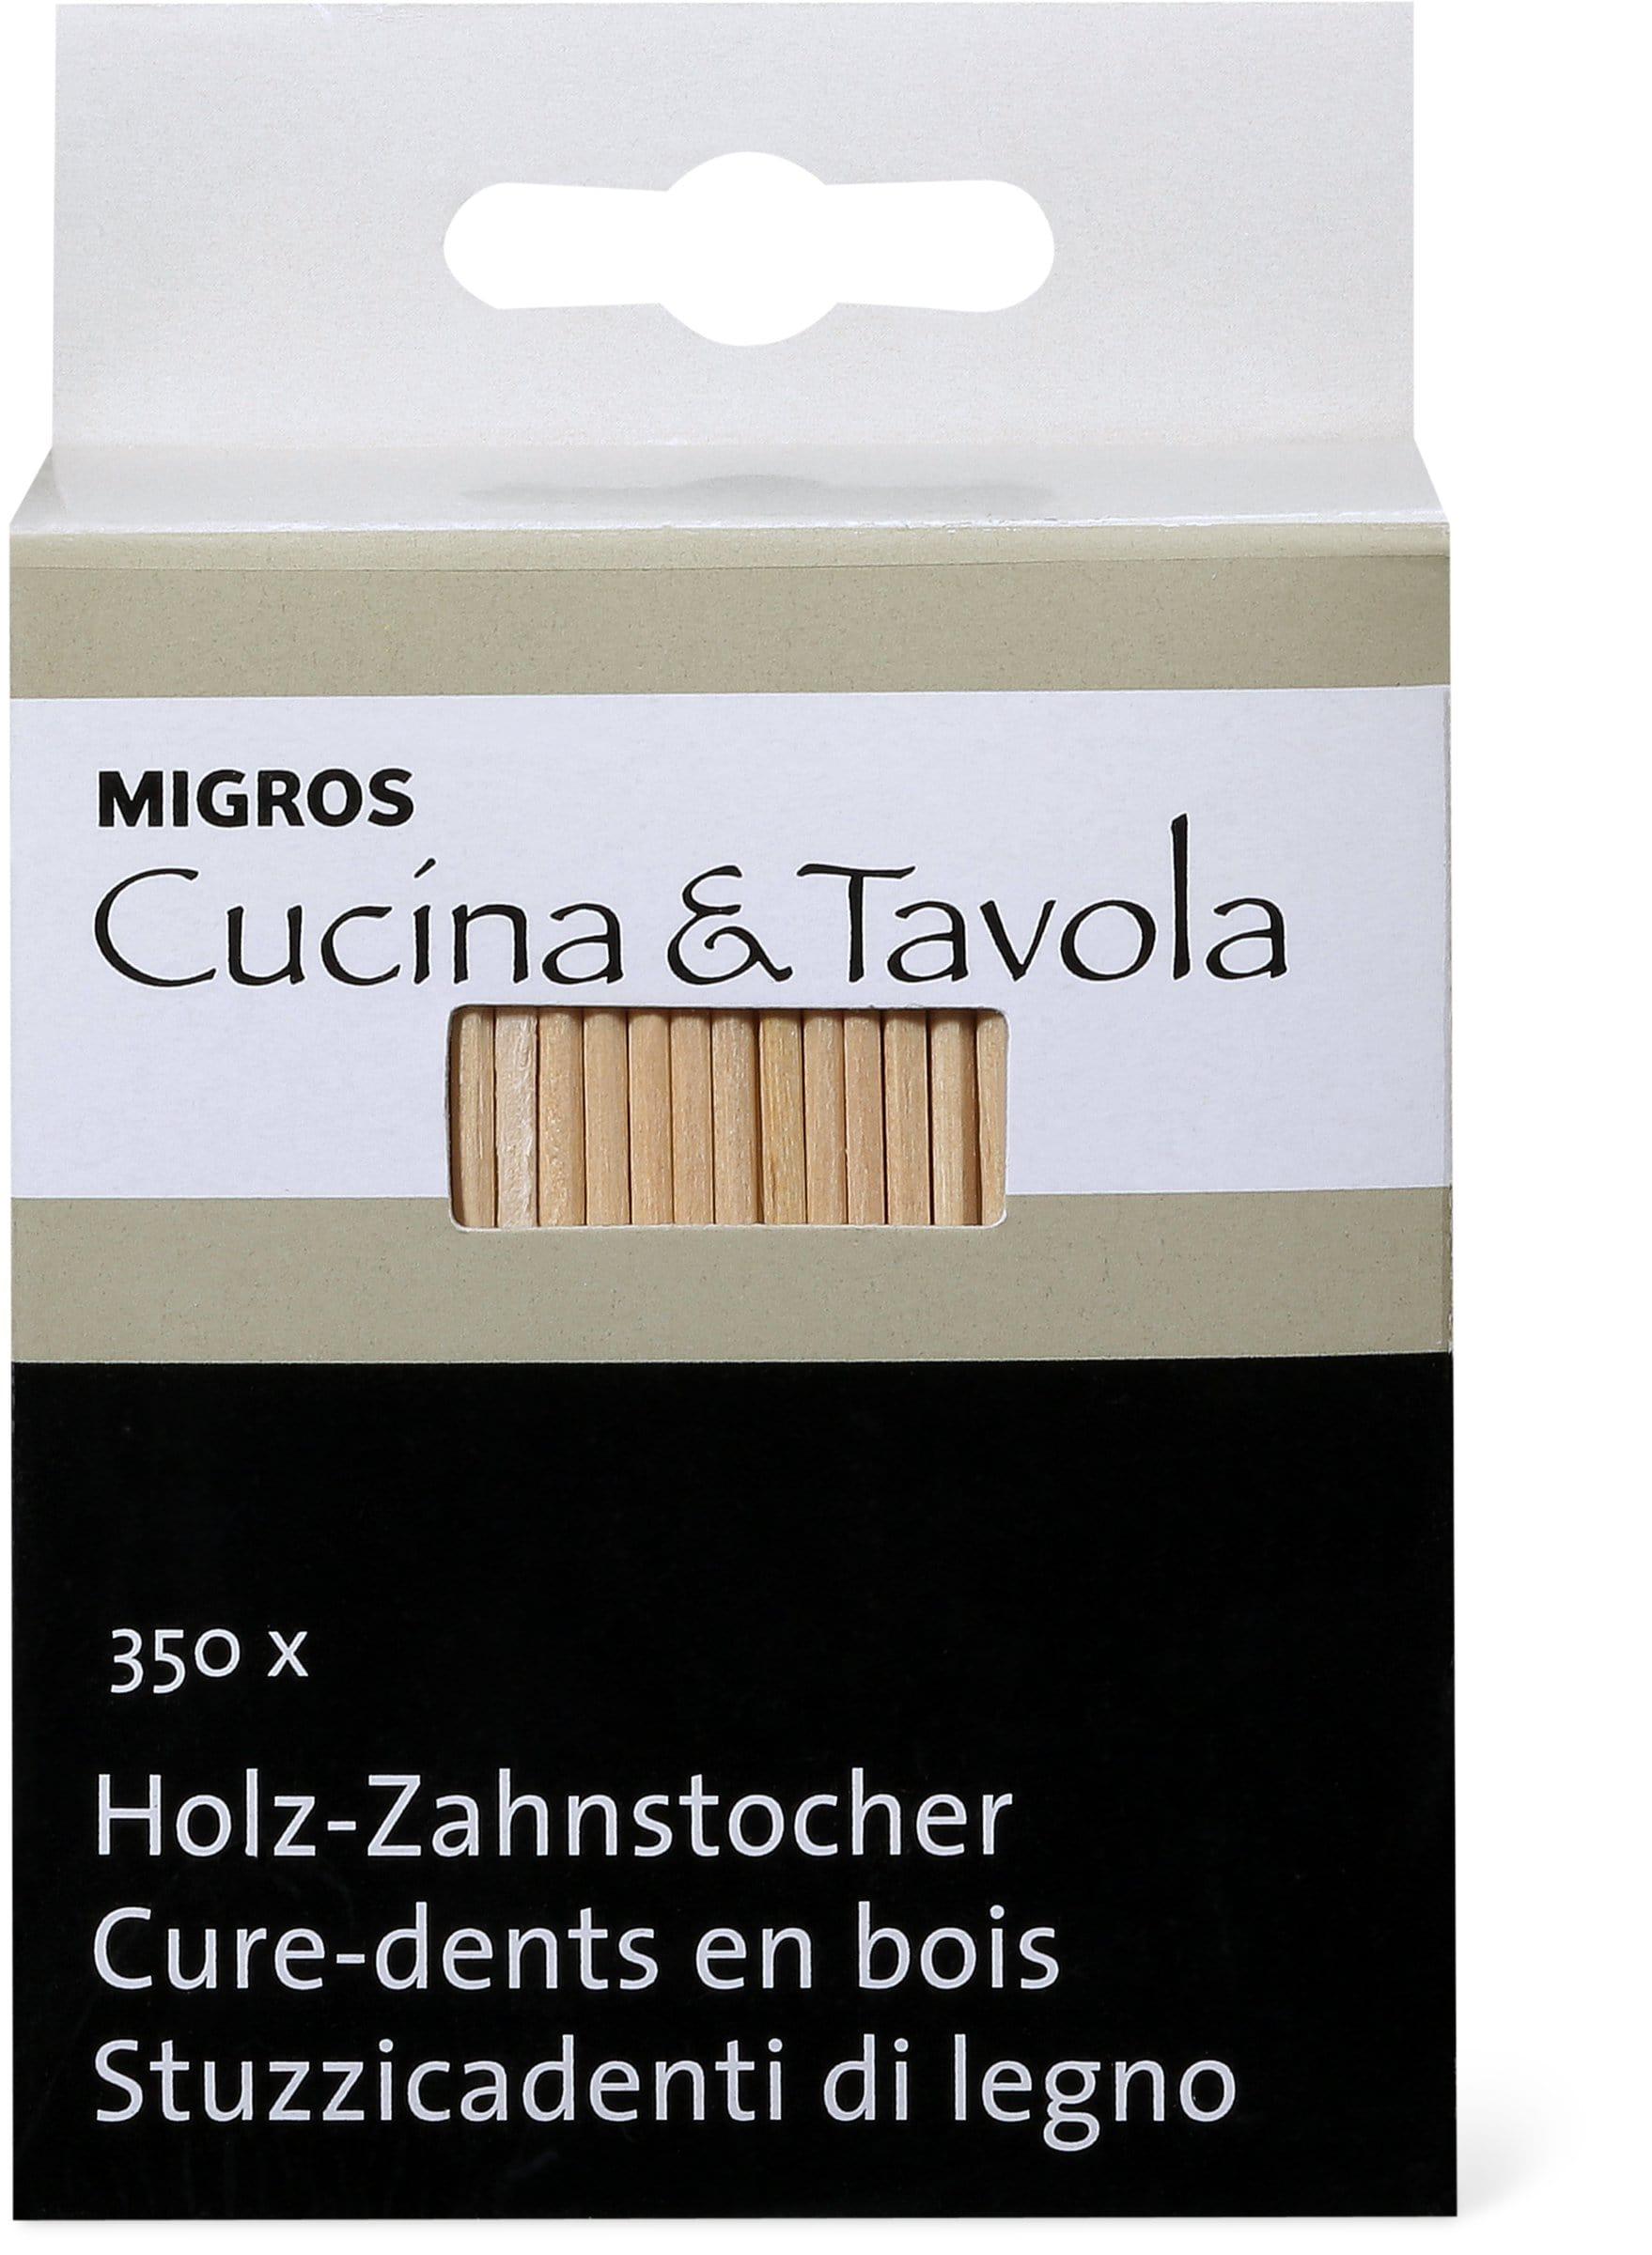 Cucina & Tavola Cure-dents en bois